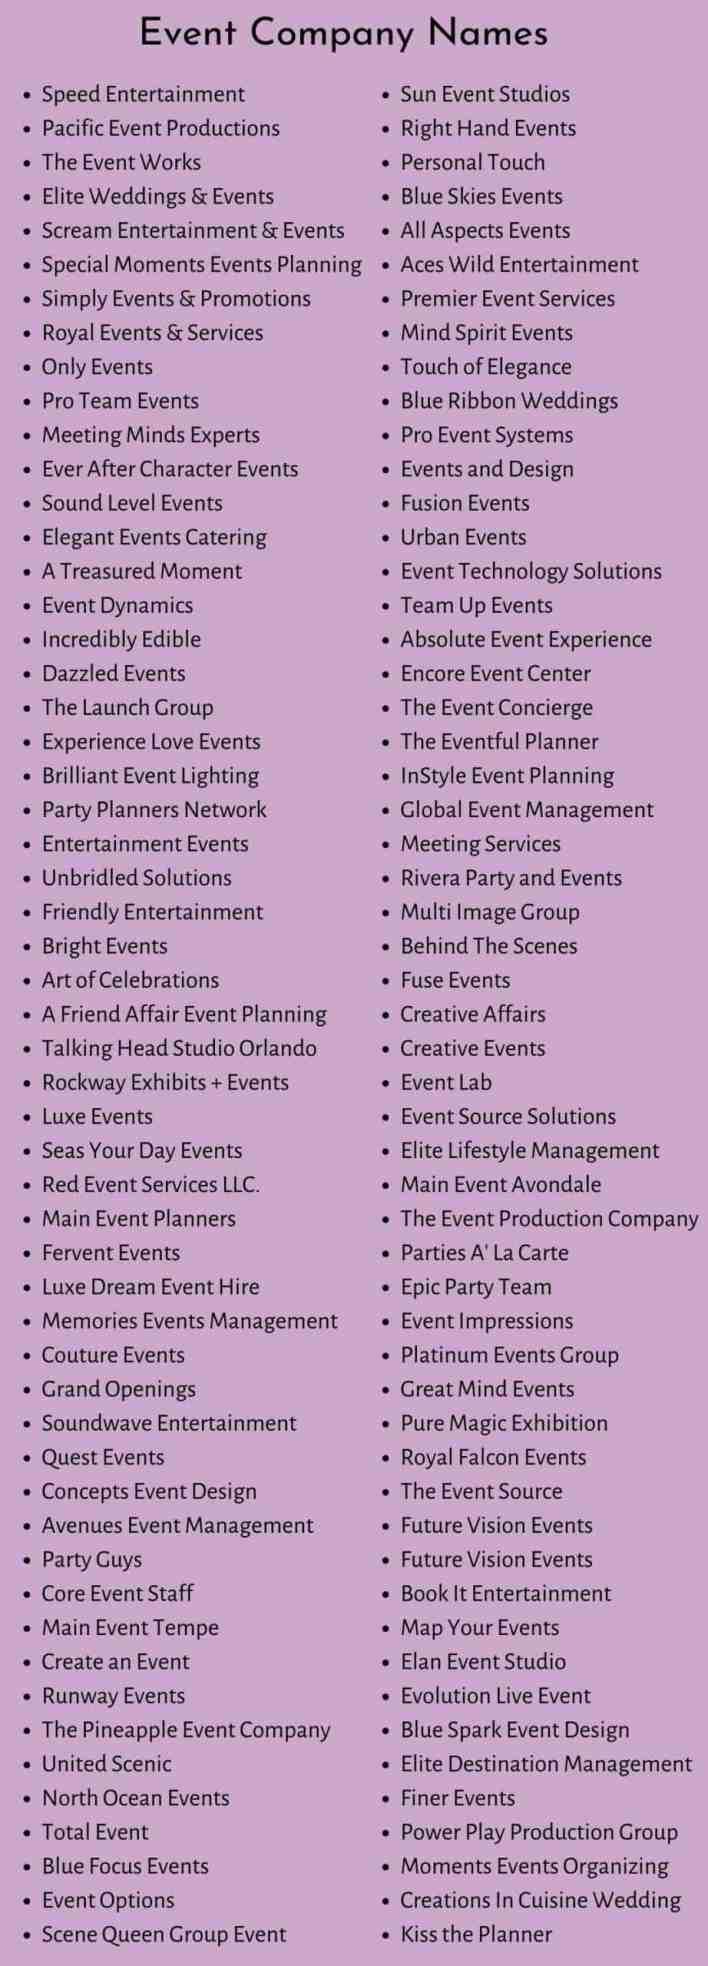 Event Company Names